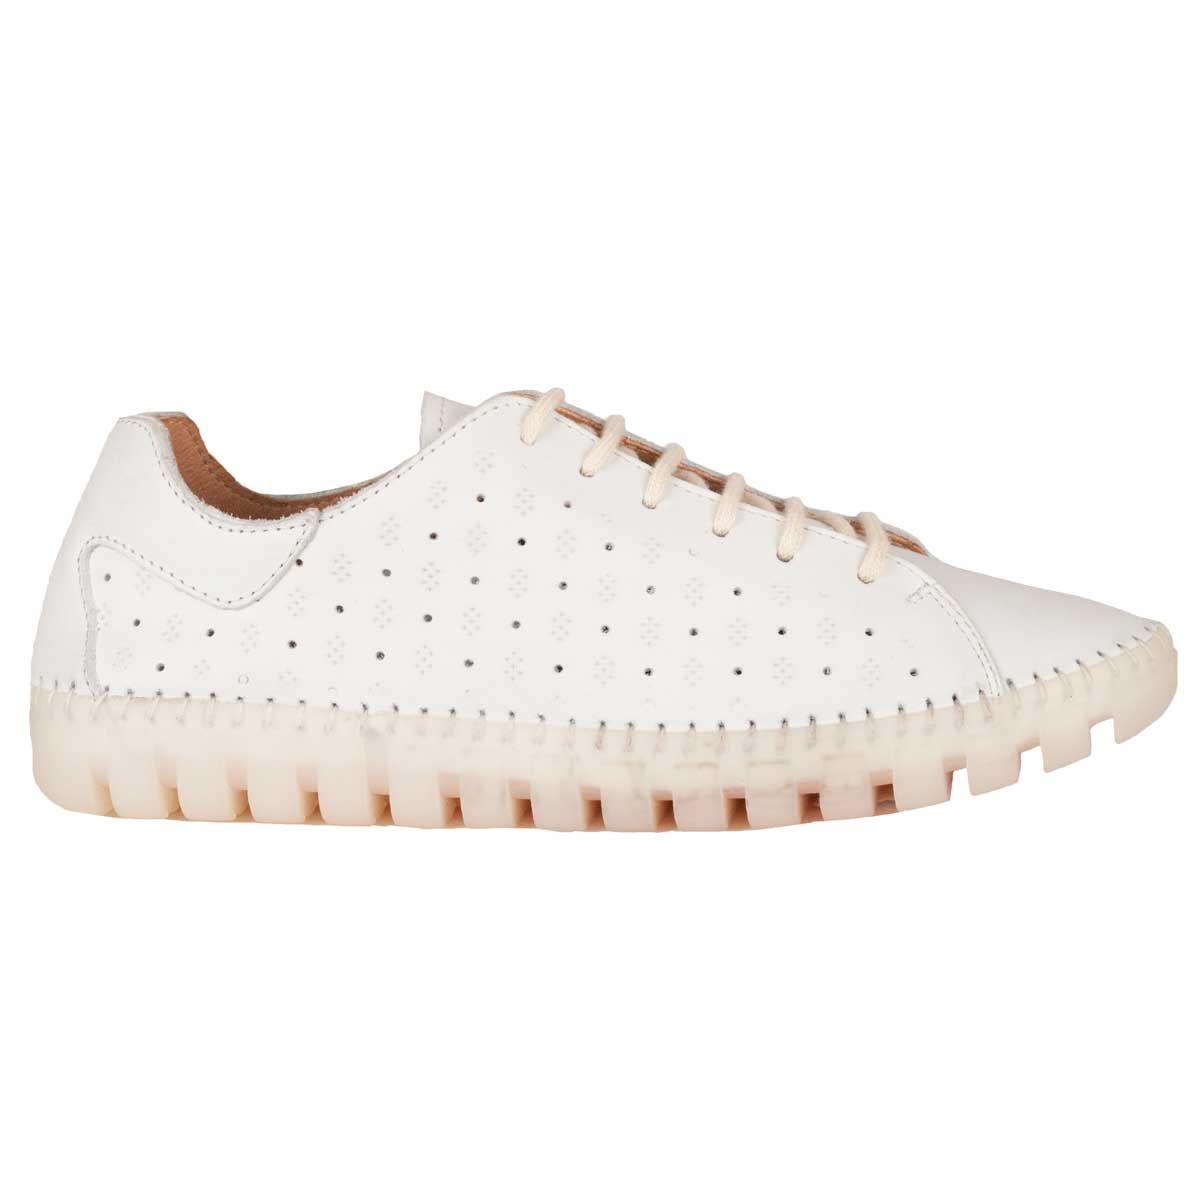 Purapiel Cleated Sole Sneaker in White